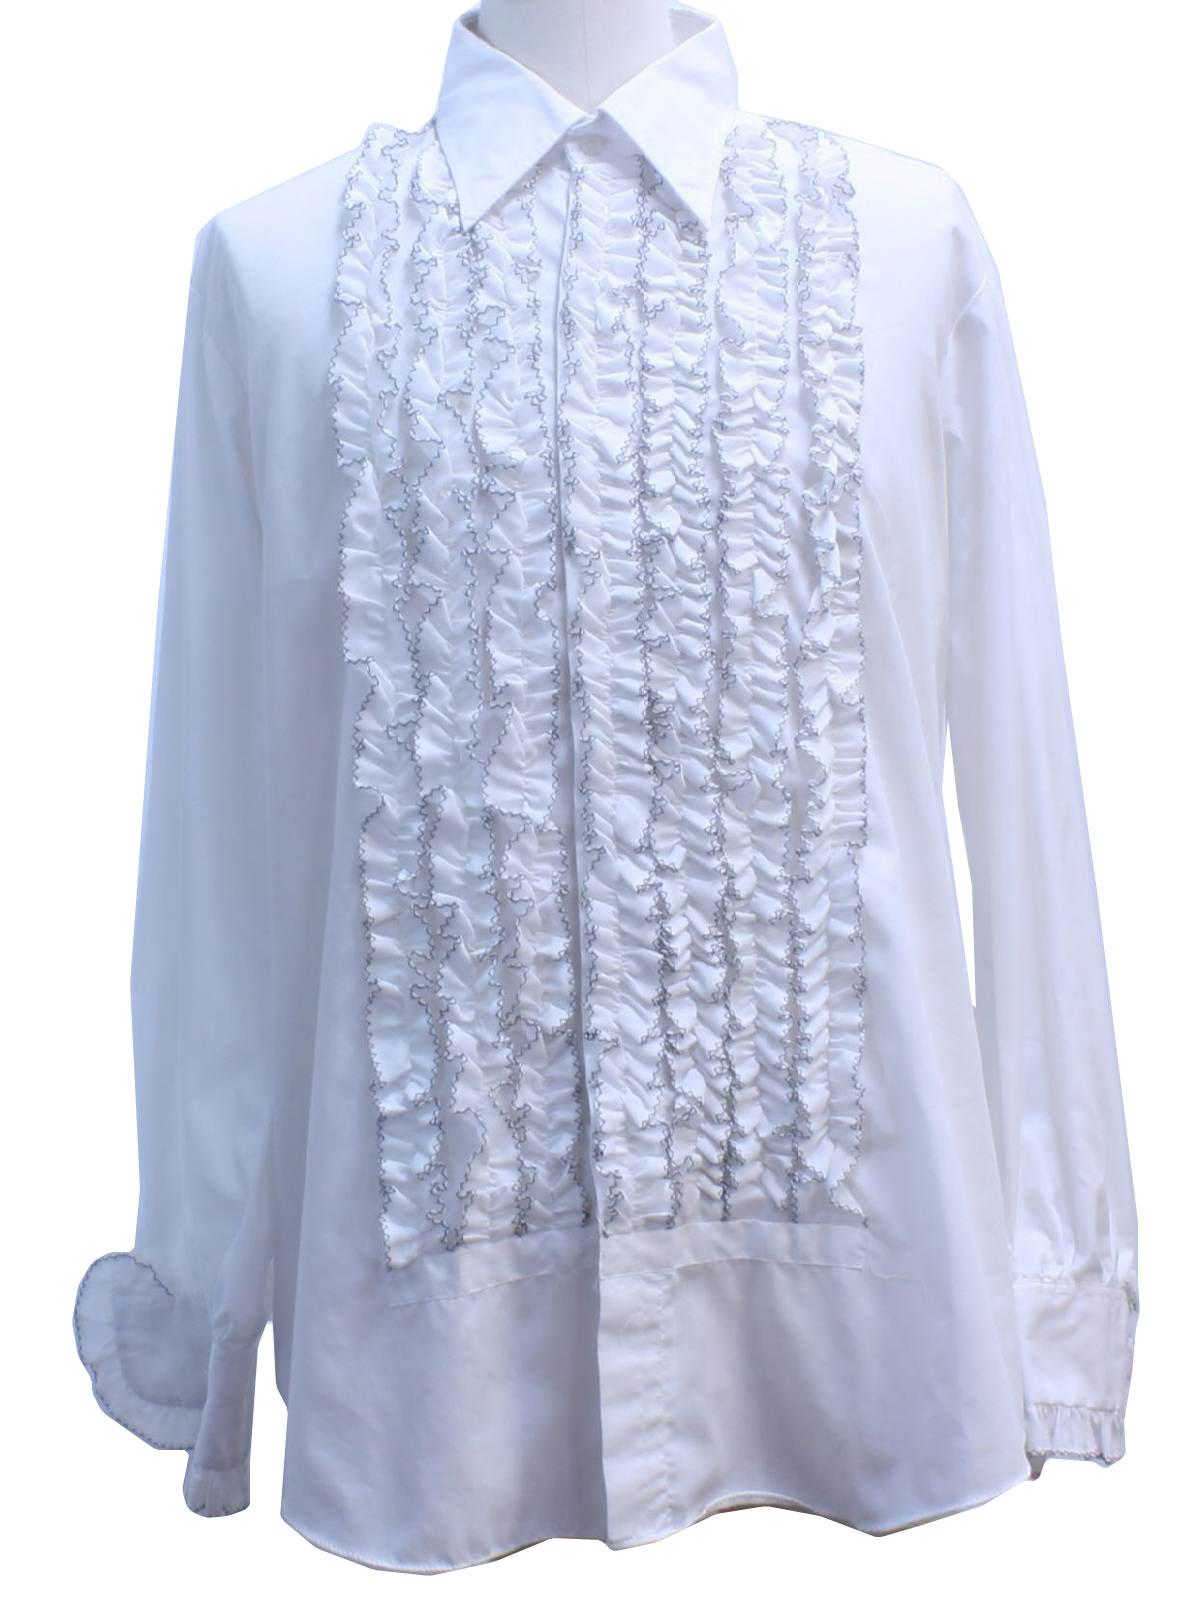 1970s ruffled tuxedo shirt